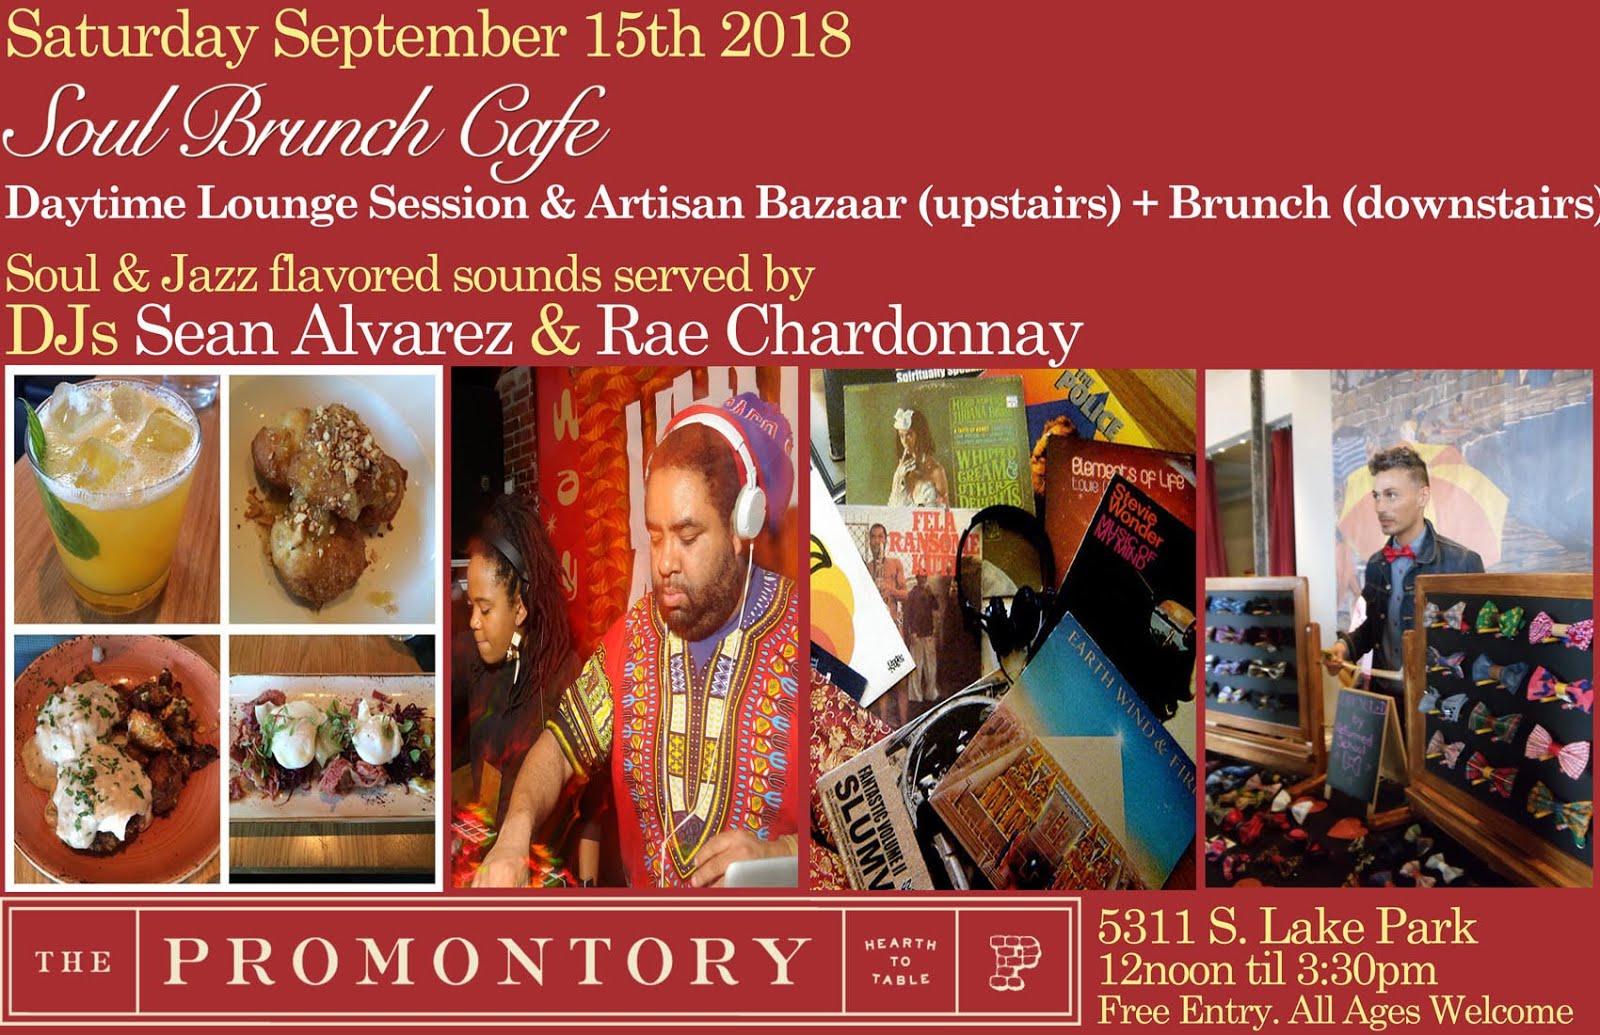 Sat Sept 15th 12noon-330pm: Soul Brunch Cafe @ The Promontory